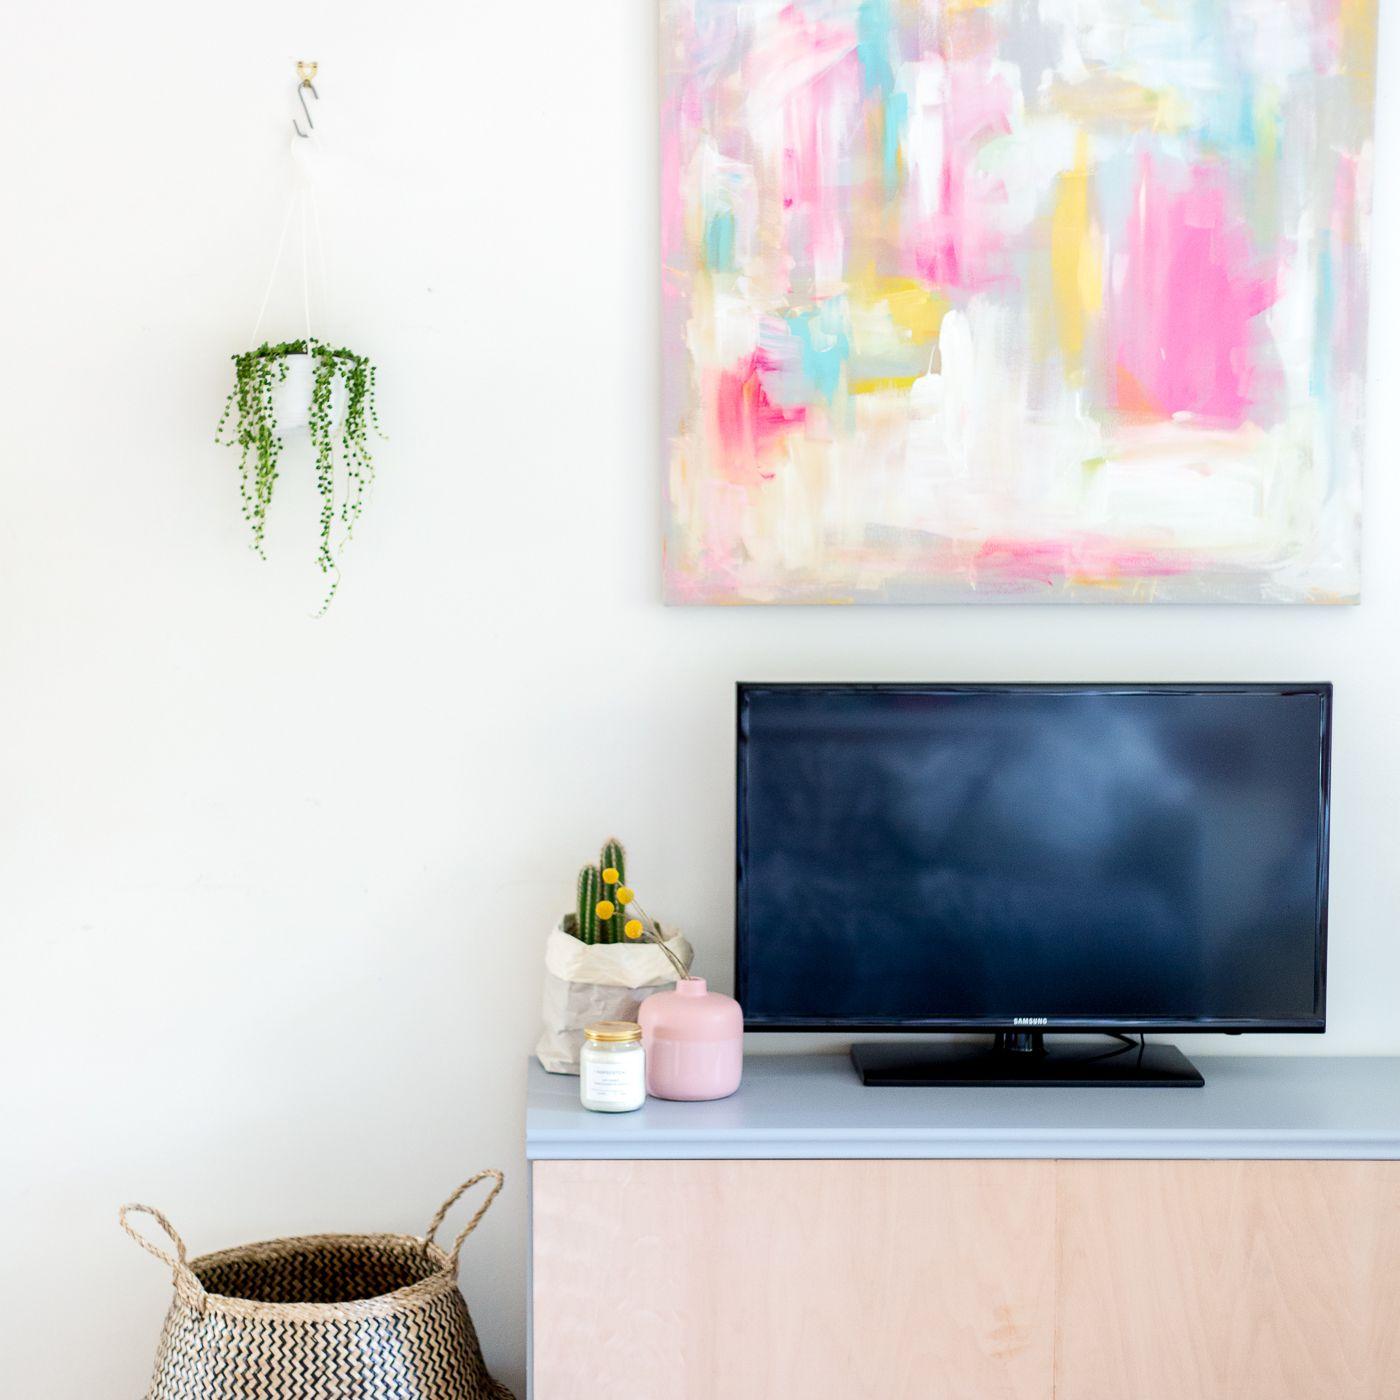 DIY Media Center Sideboard